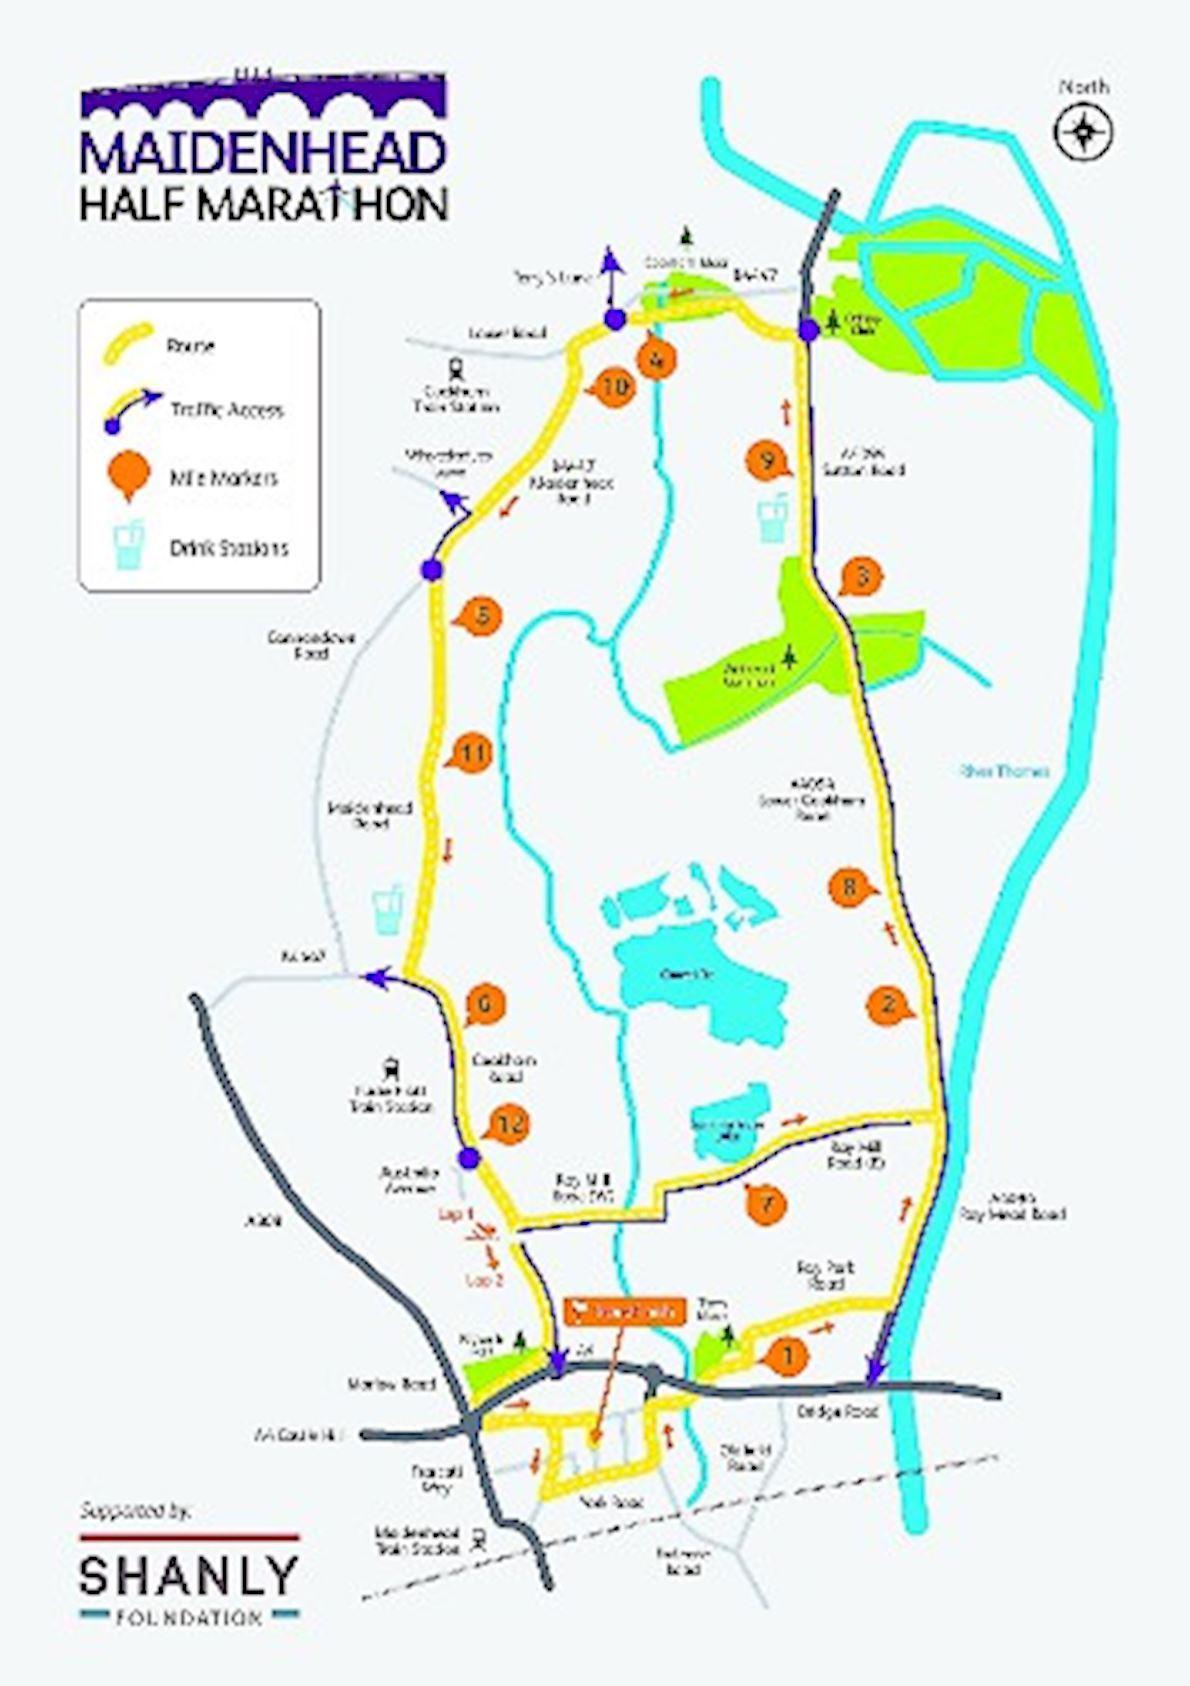 Maidenhead Half Marathon 路线图